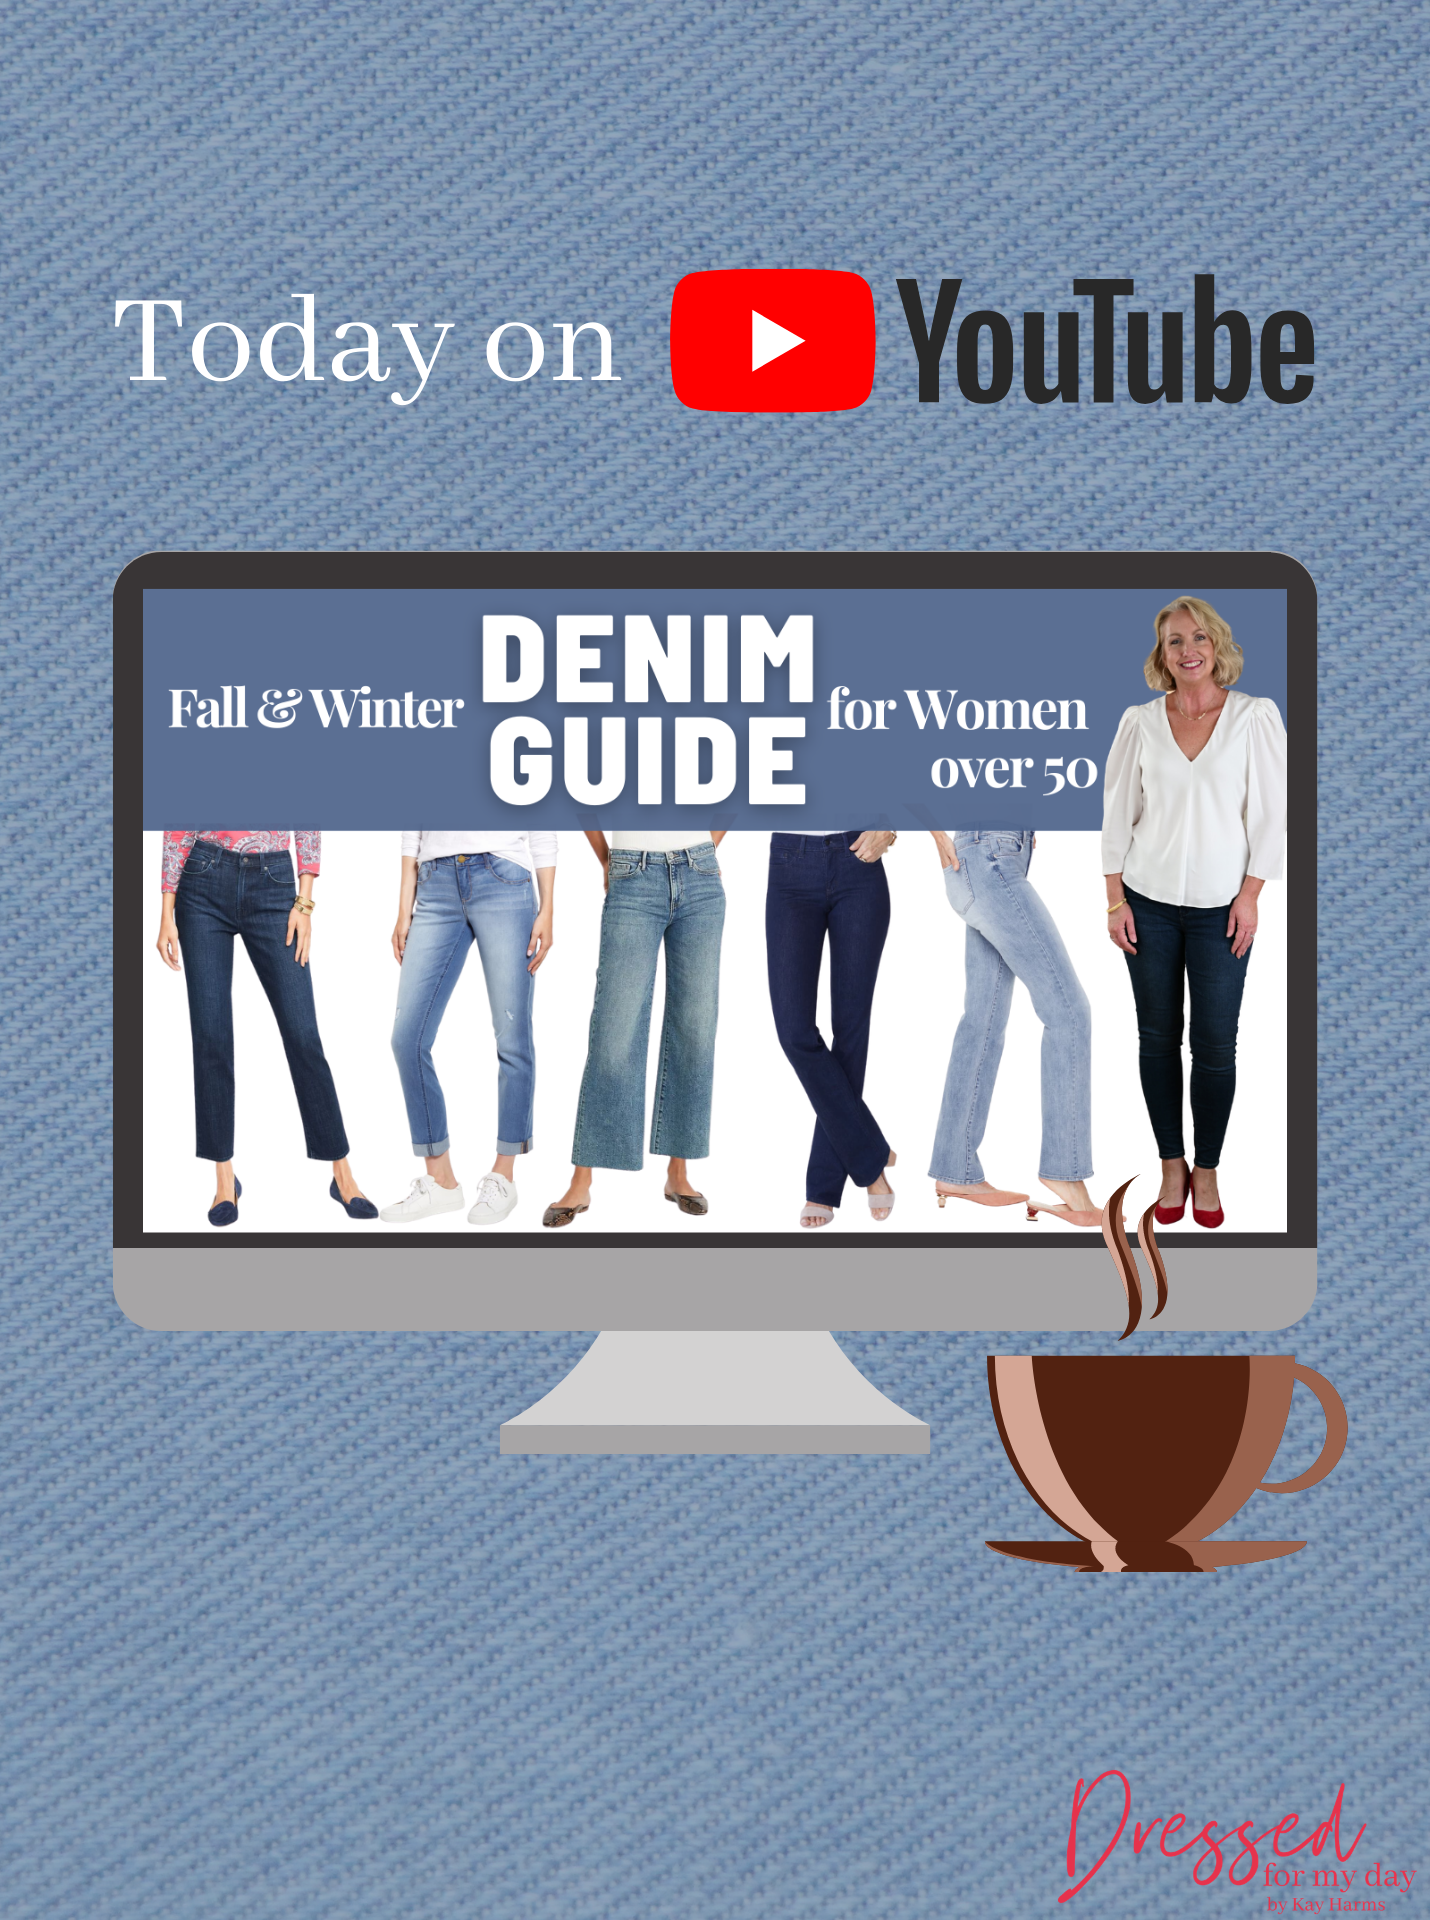 Fall & Winter Denim Guide